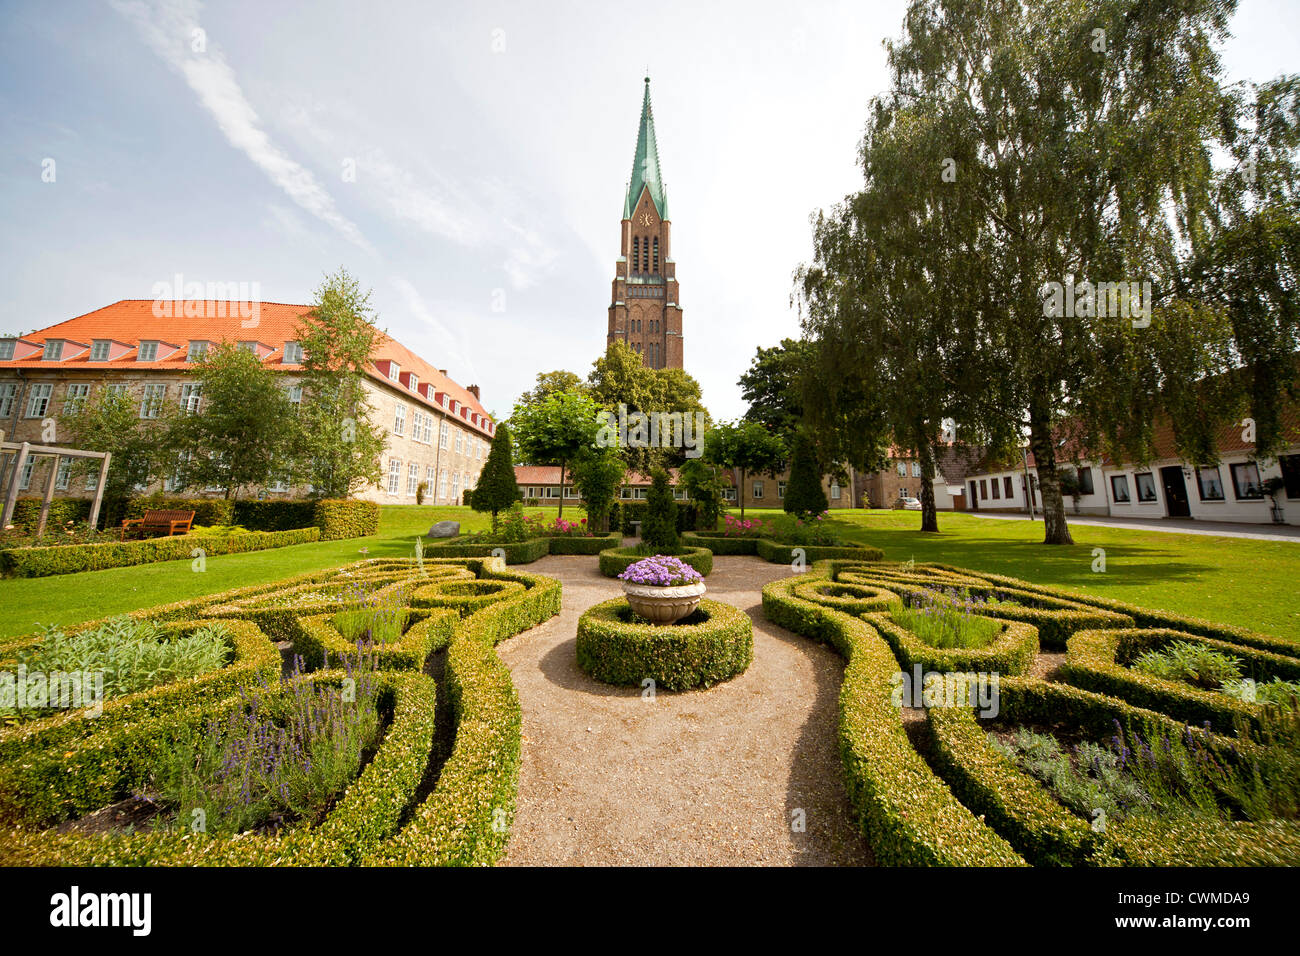 Schleswig Cathedral, Schleswig, Schleswig-Holstein, Germany, Europe - Stock Image